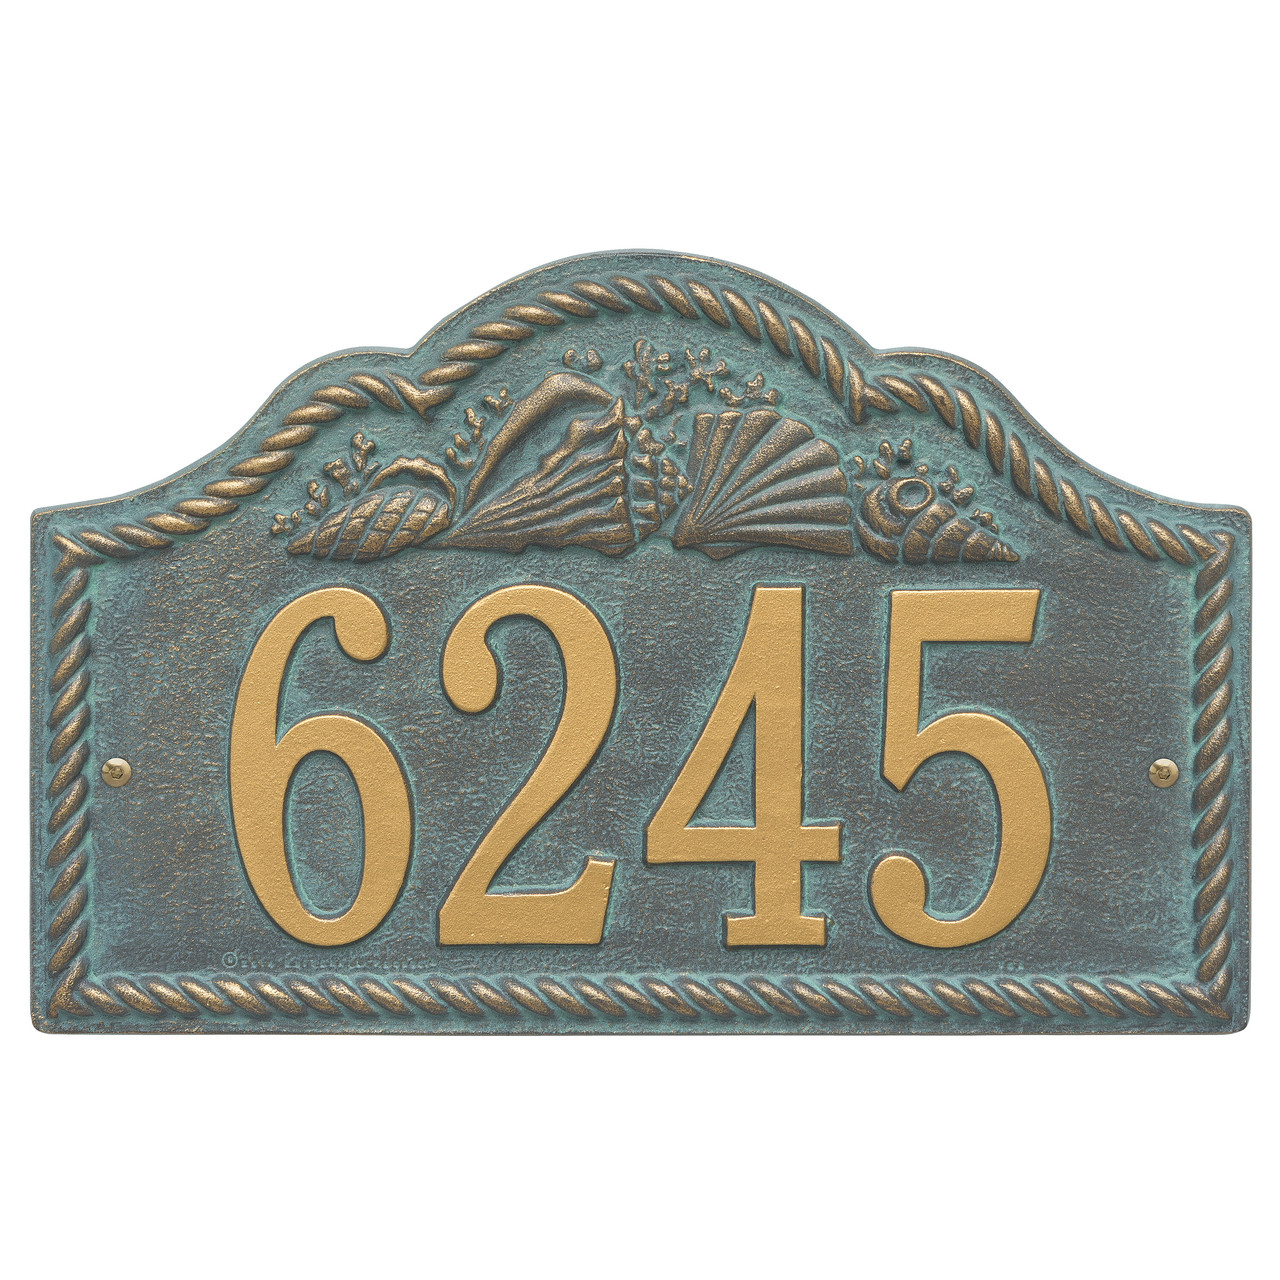 5124BV